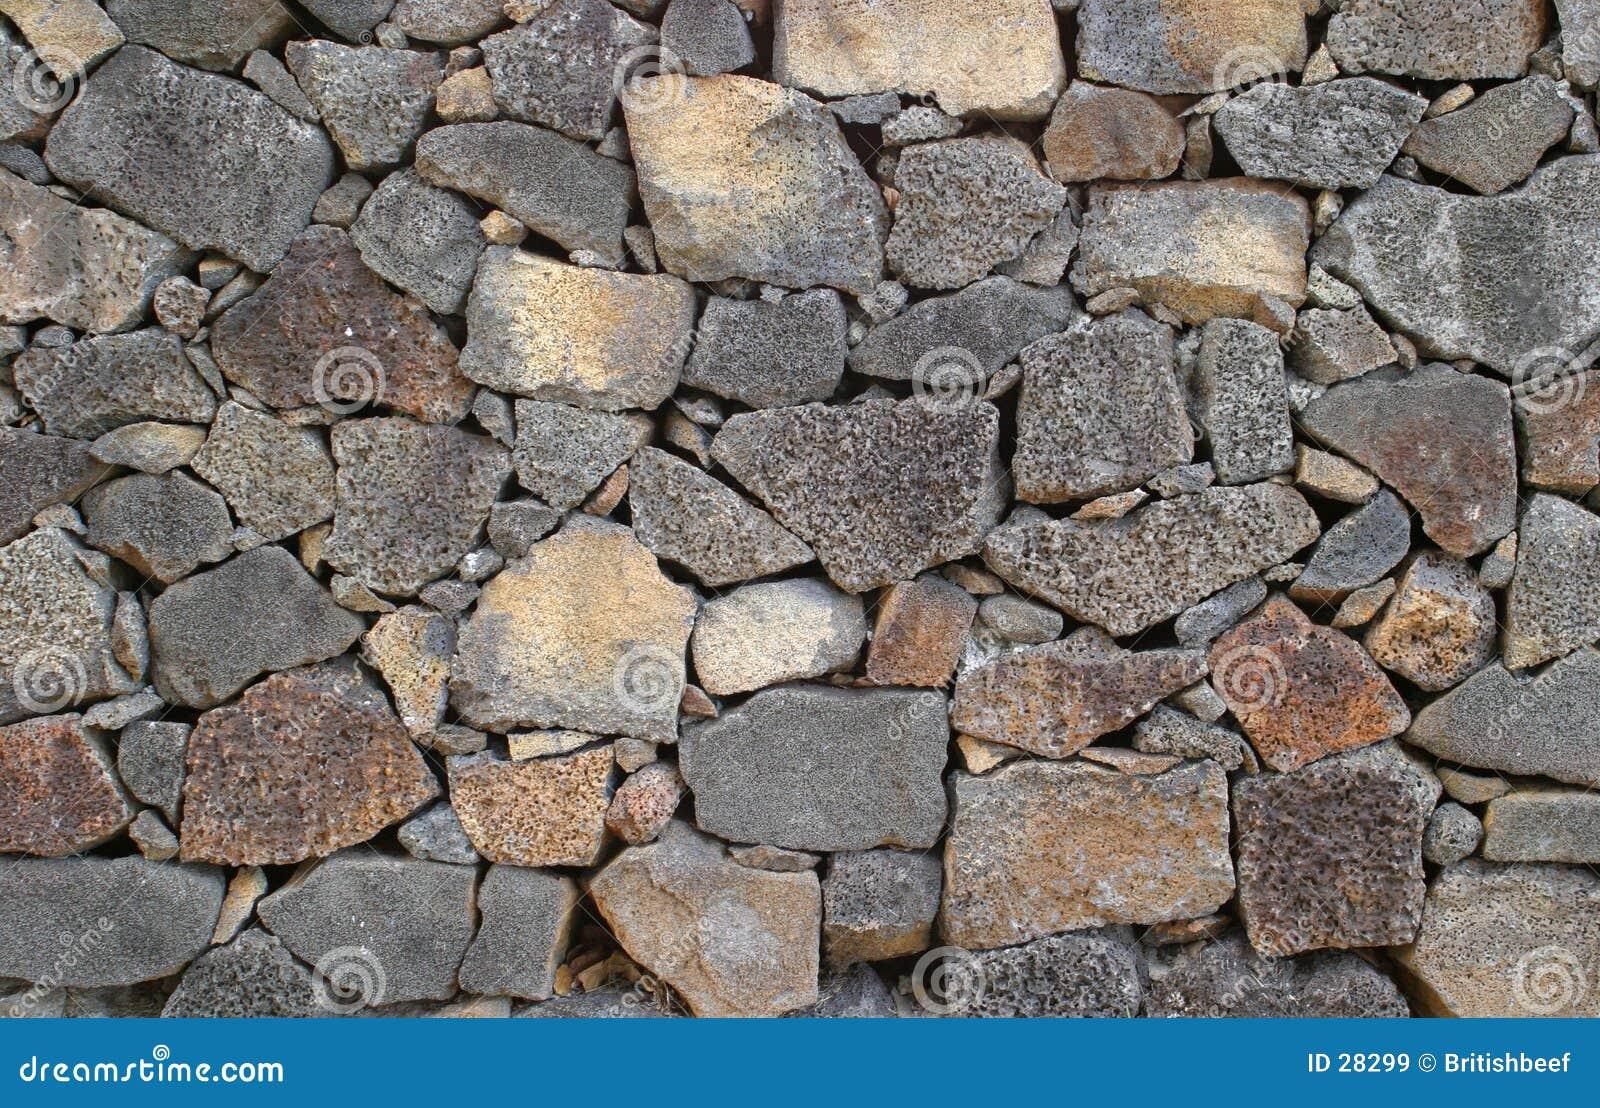 Volcanic rock wall stock image. Image of volcanic, rock ...